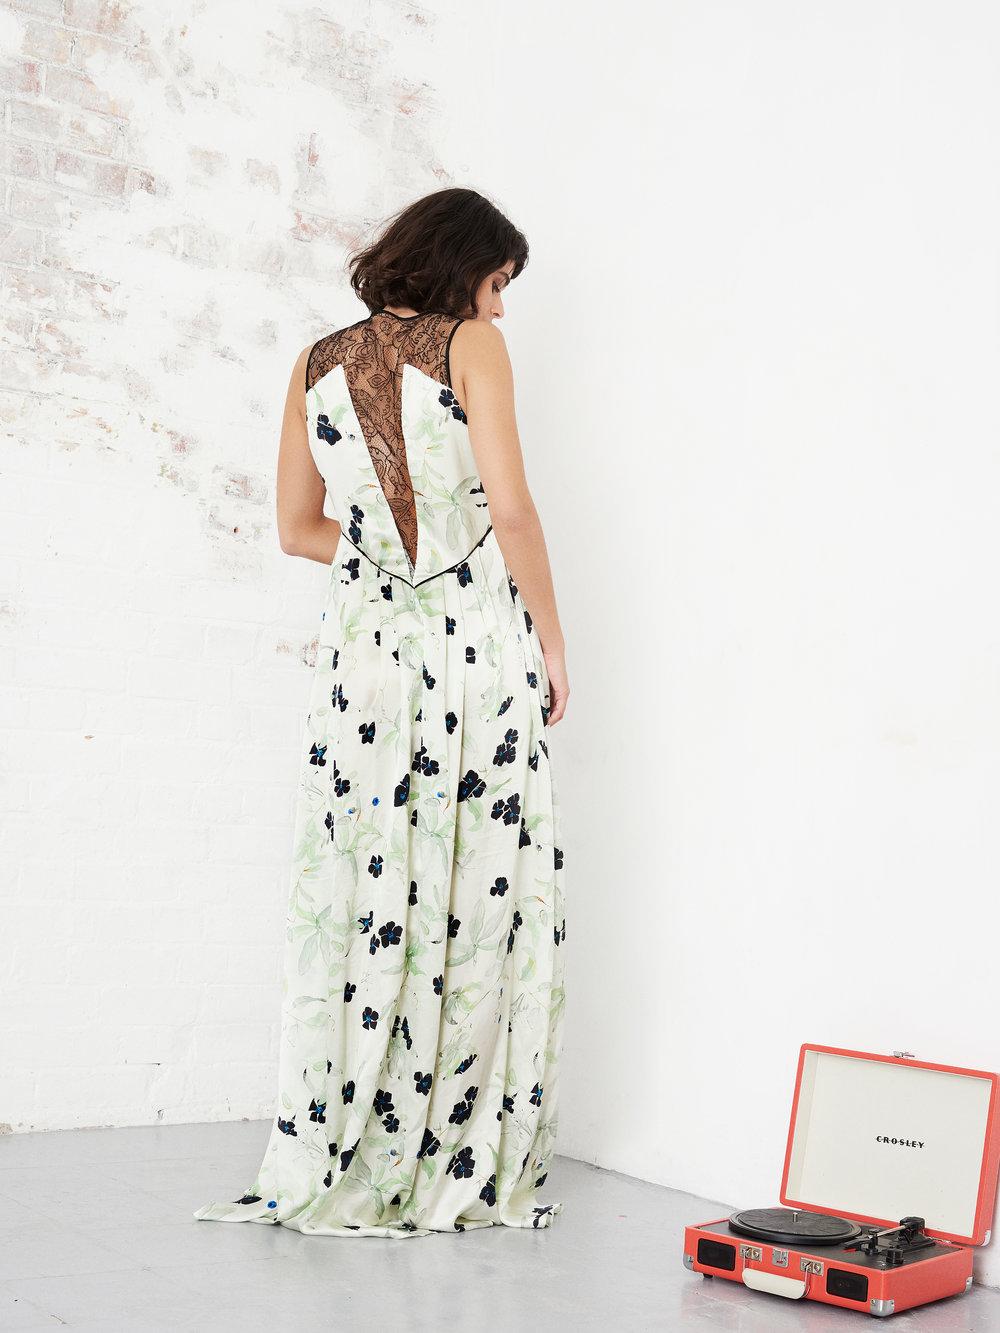 Violet & Wren Lace Back Gown in Neo Mint Vine